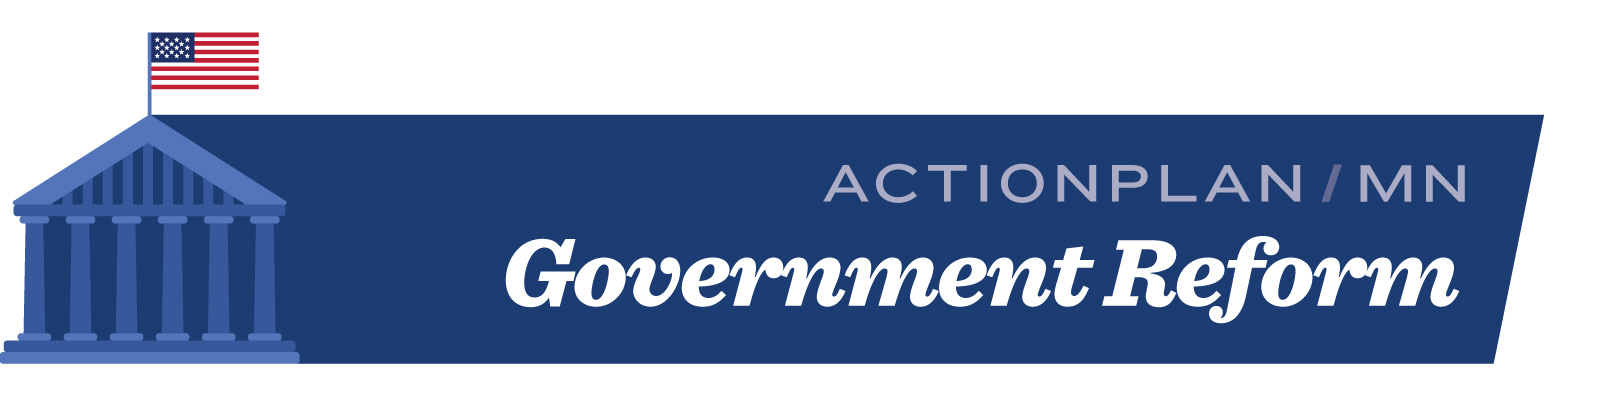 ActionPlanMN #1 Government Reform